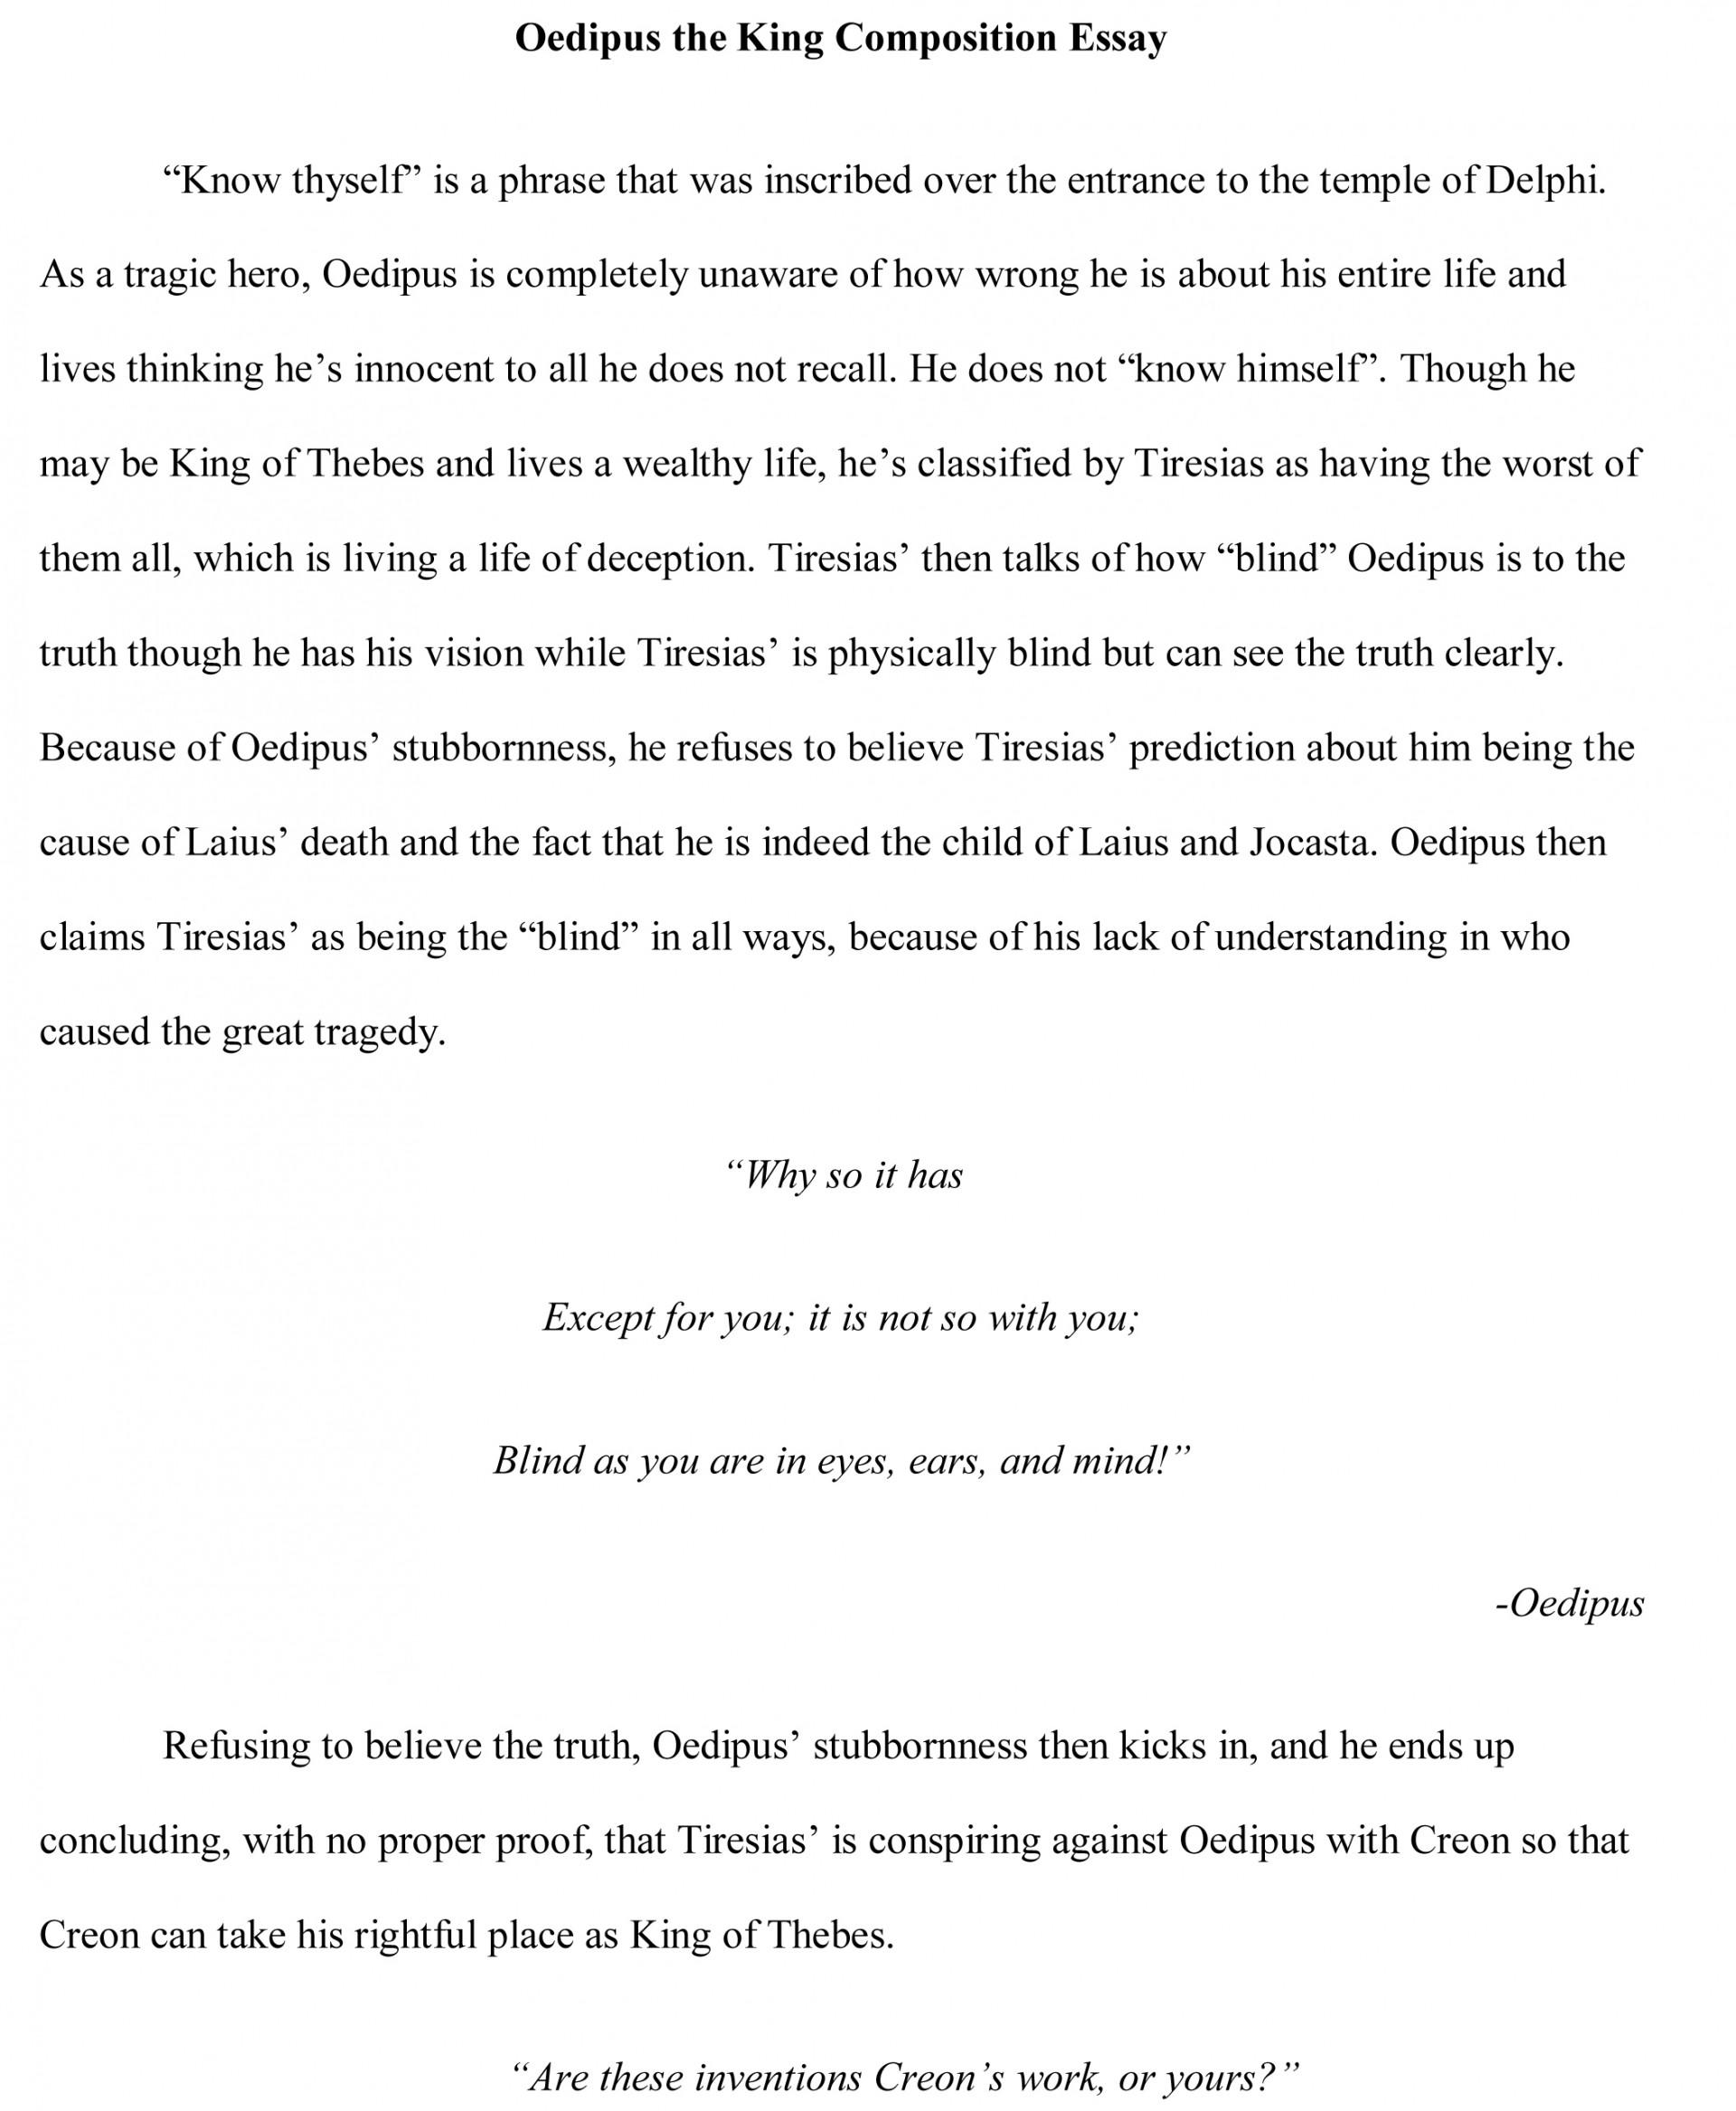 005 Oedipus Essay Free Sample Good Topics To Write An On Marvelous Easy Persuasive Essays Opinion 1920